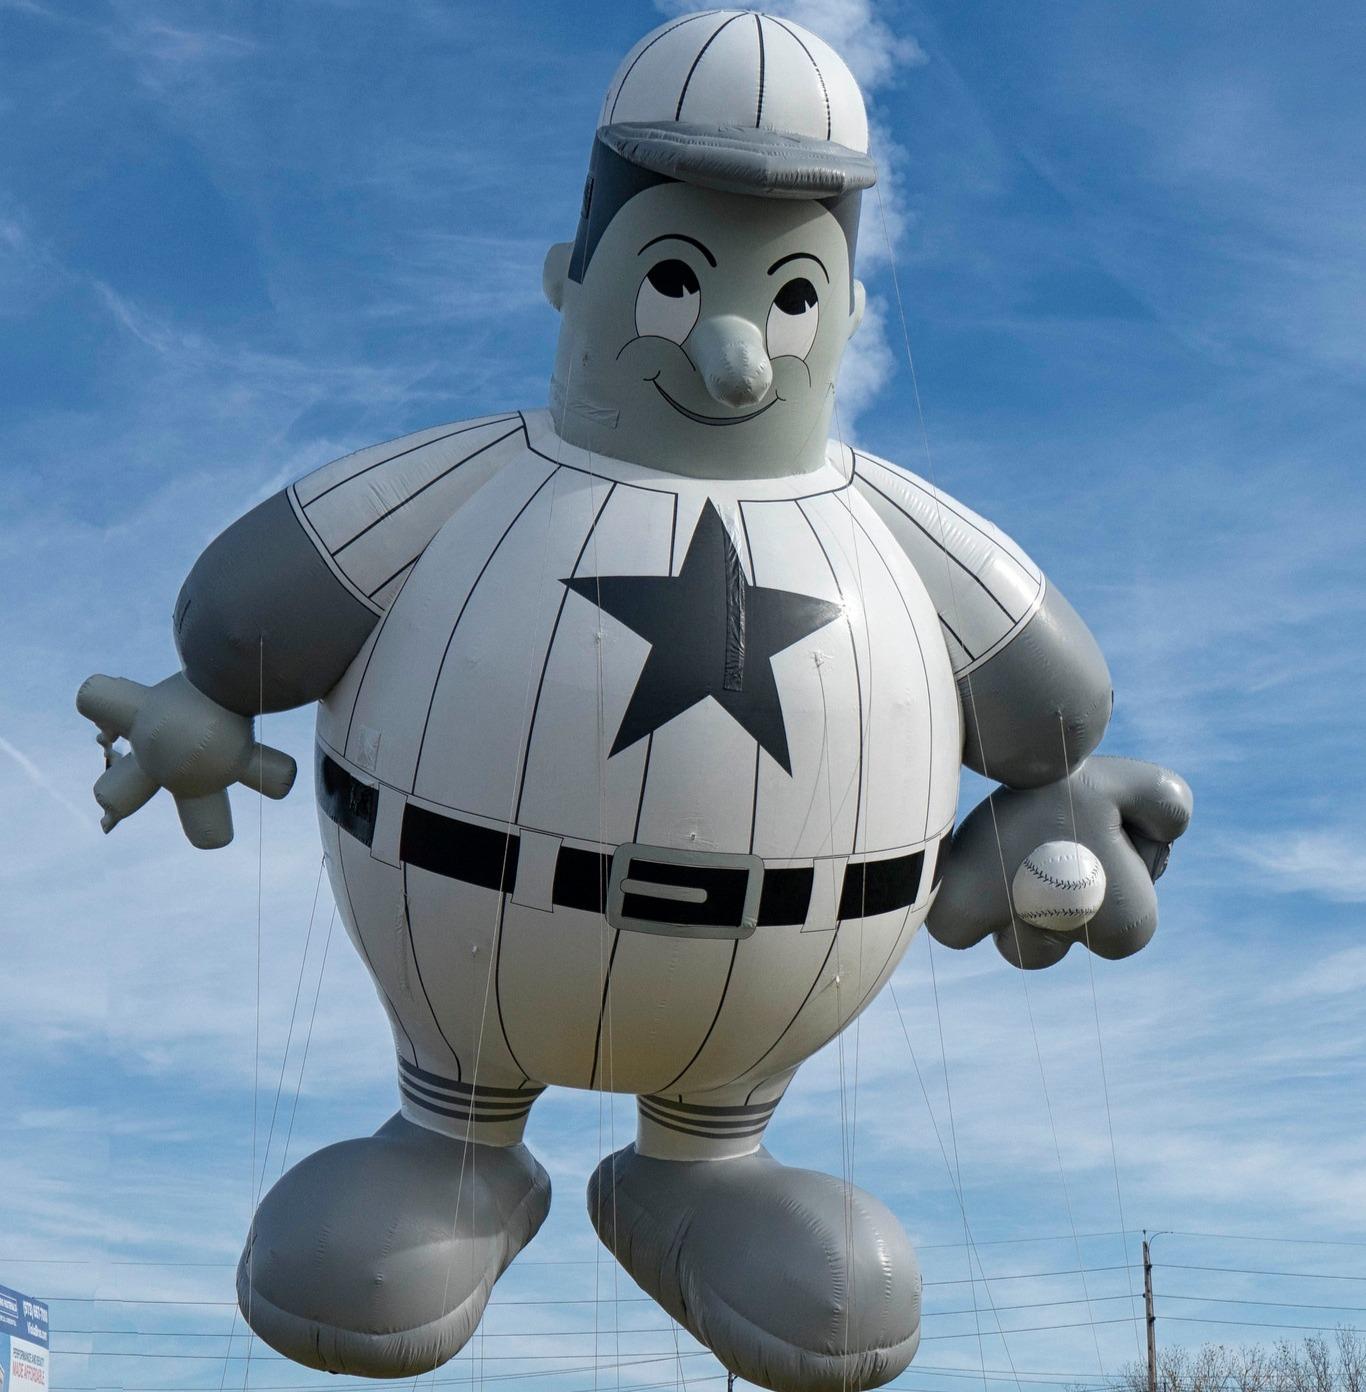 Harold the Baseball Player